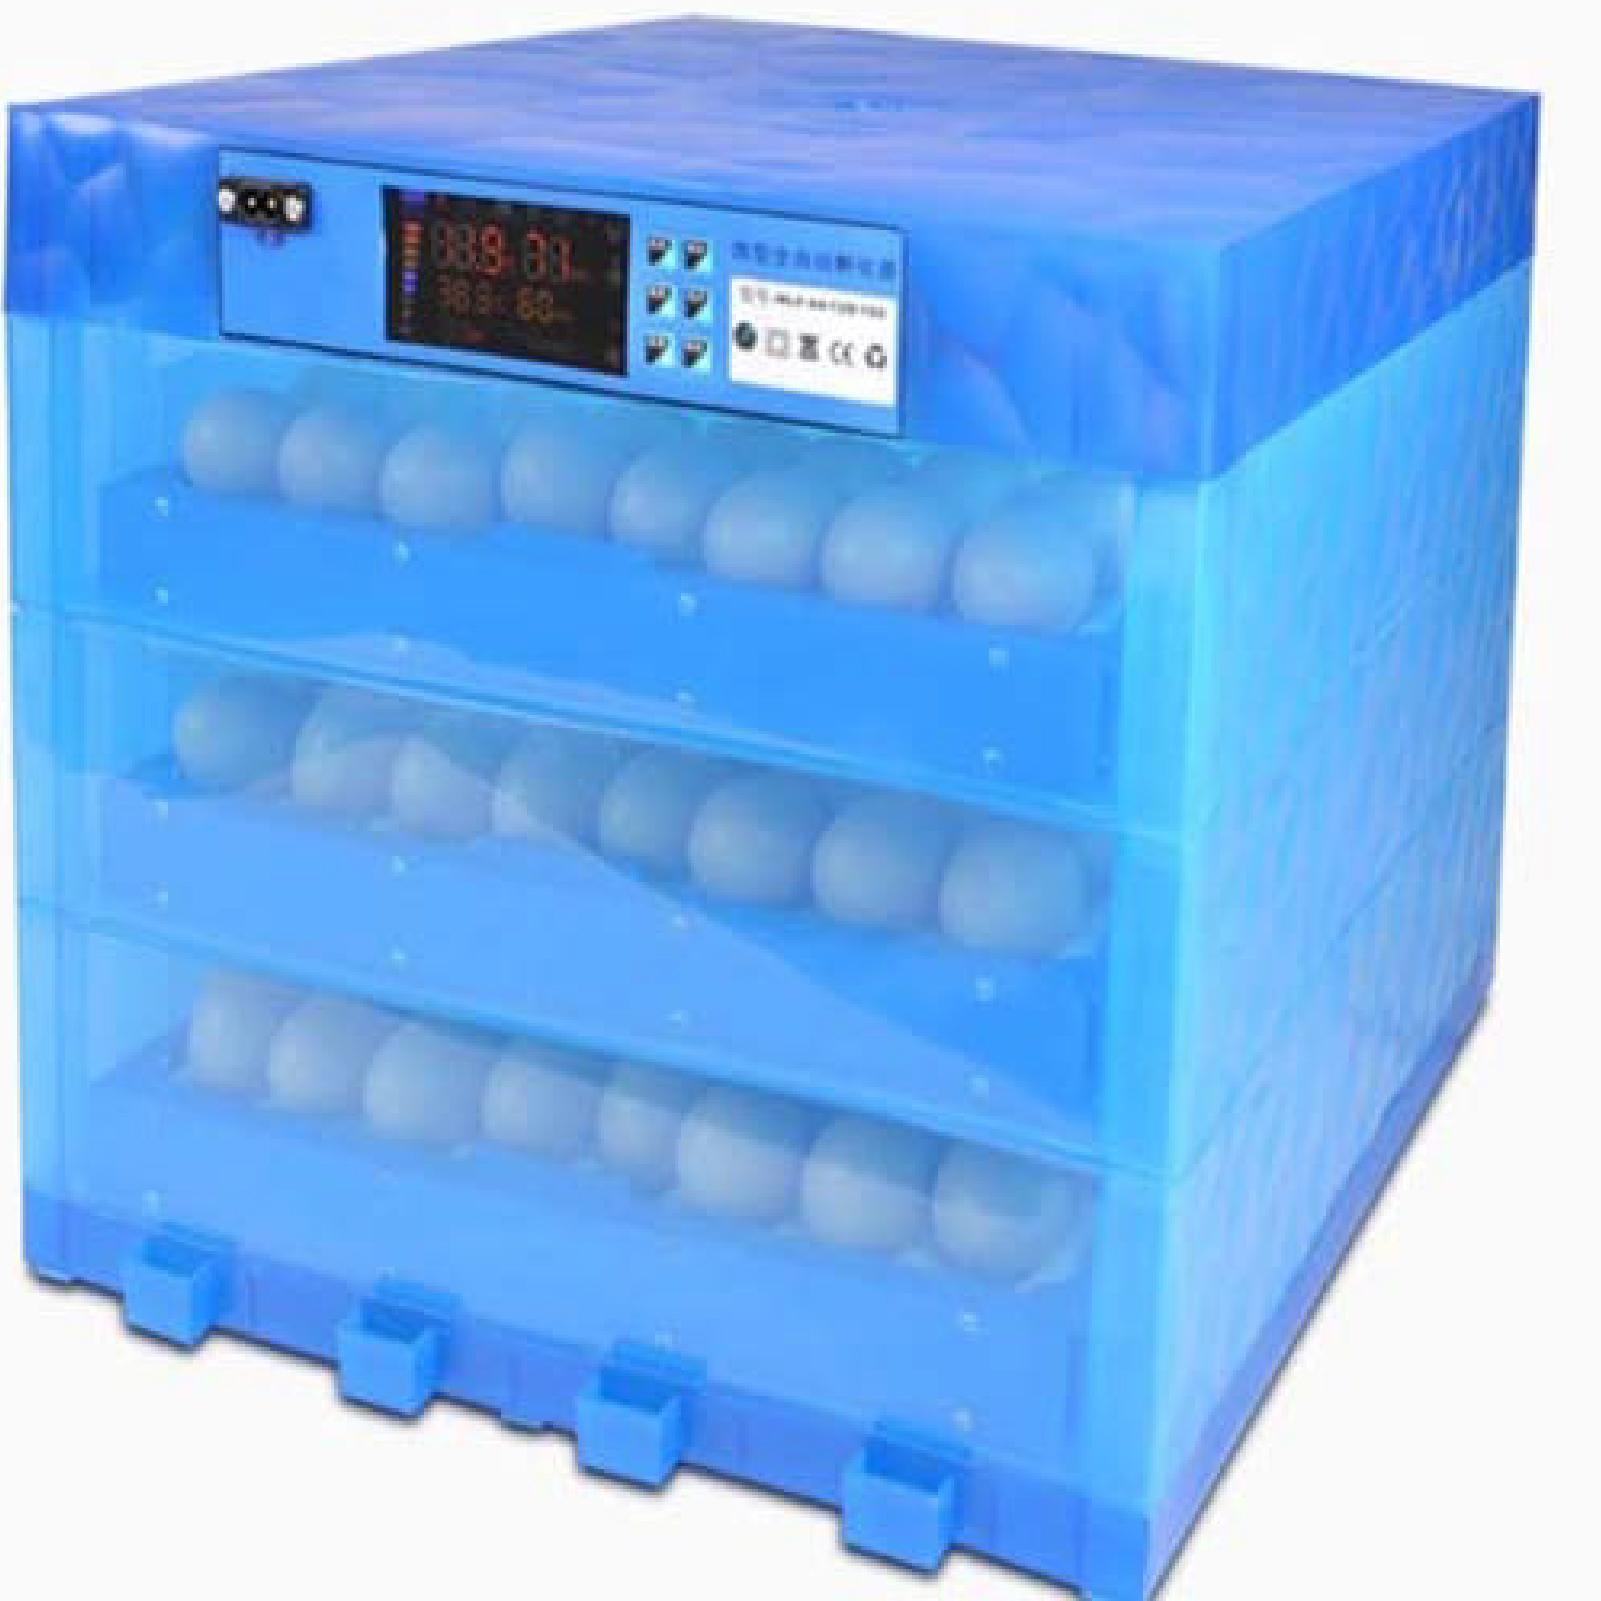 128-Eggs-Incubator